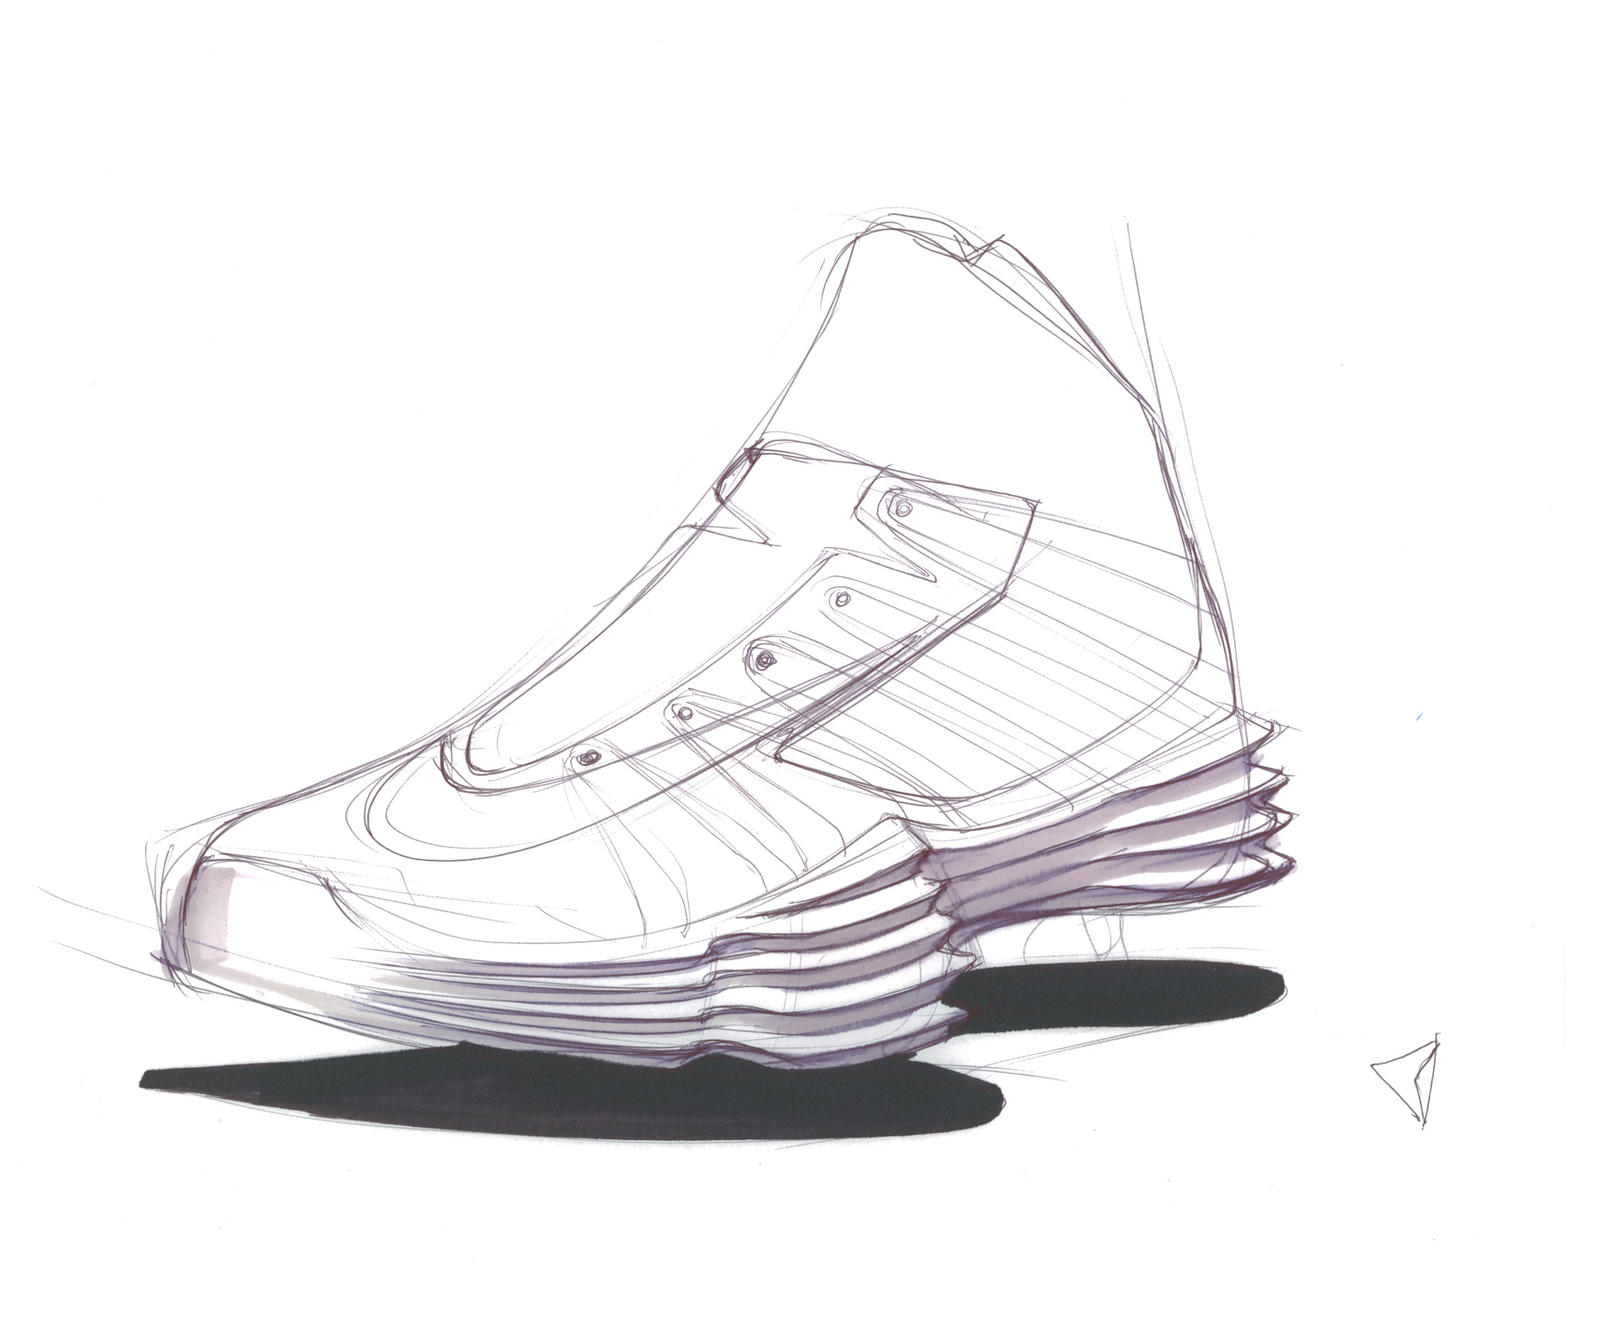 Drawn shoe design sketch basketball  Nike Basketball Image